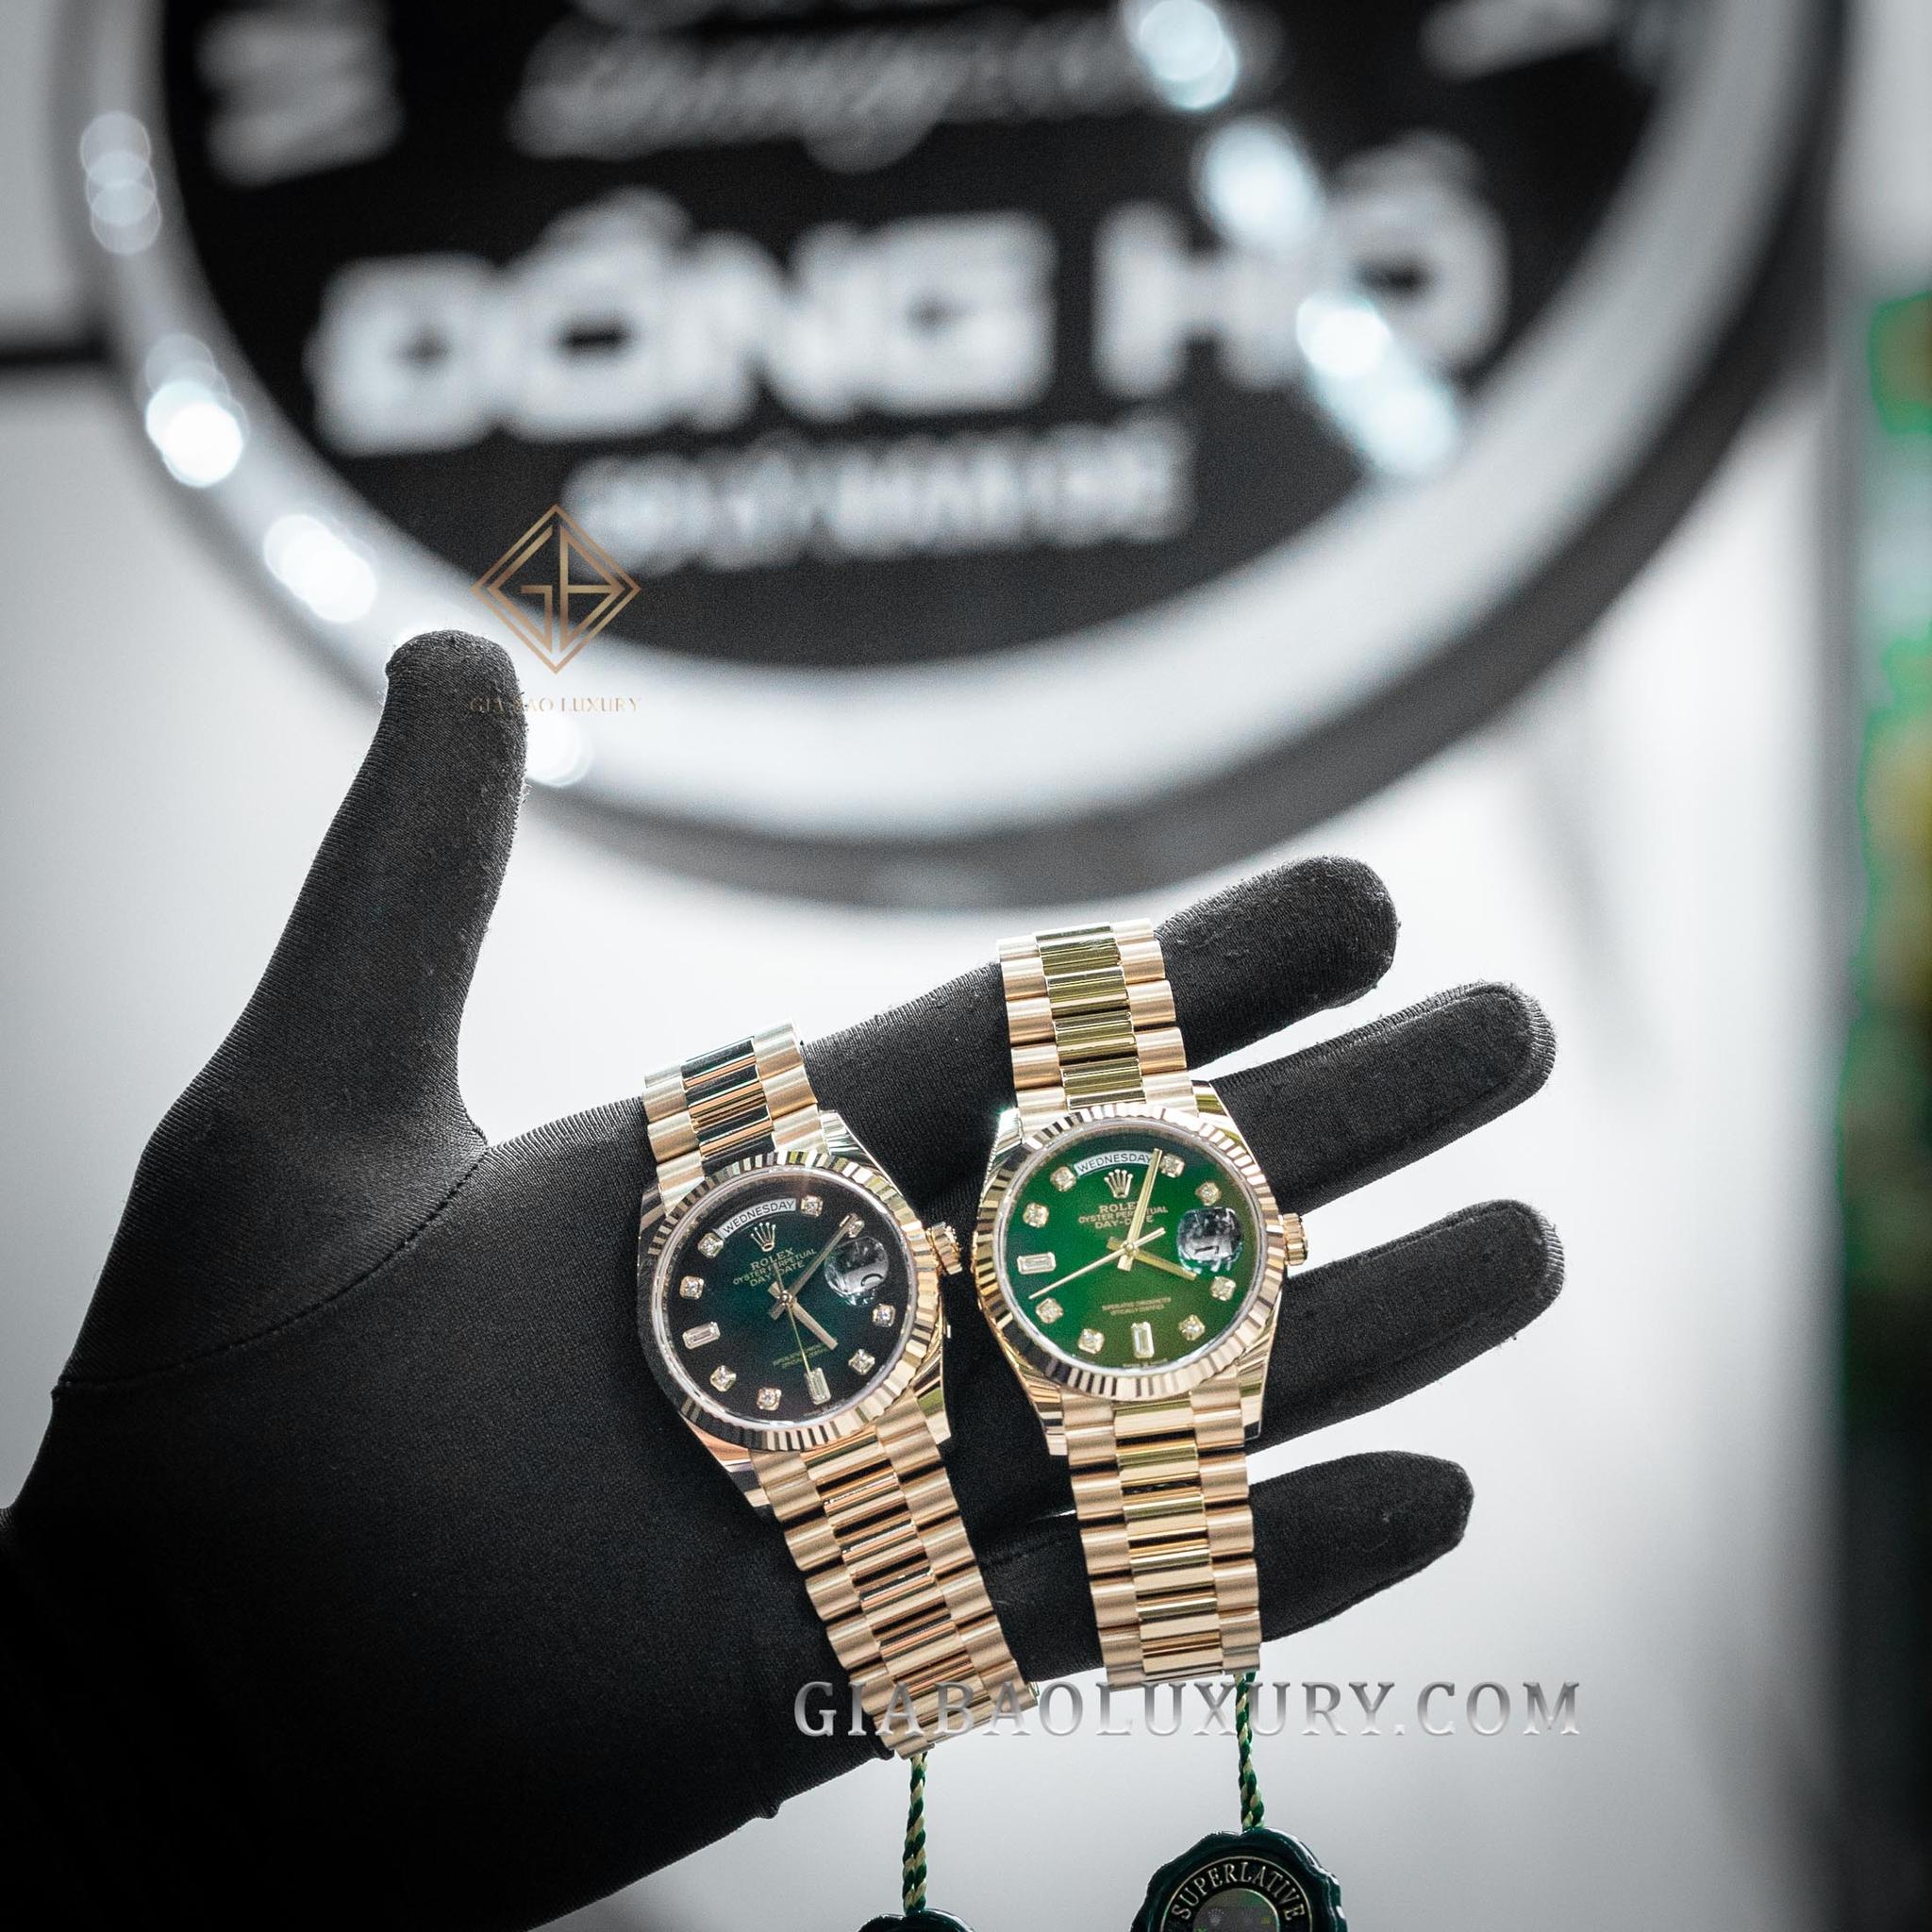 Đồng Hồ Rolex Day-Date 36 128238 Mặt Số Ombre Xanh Lá